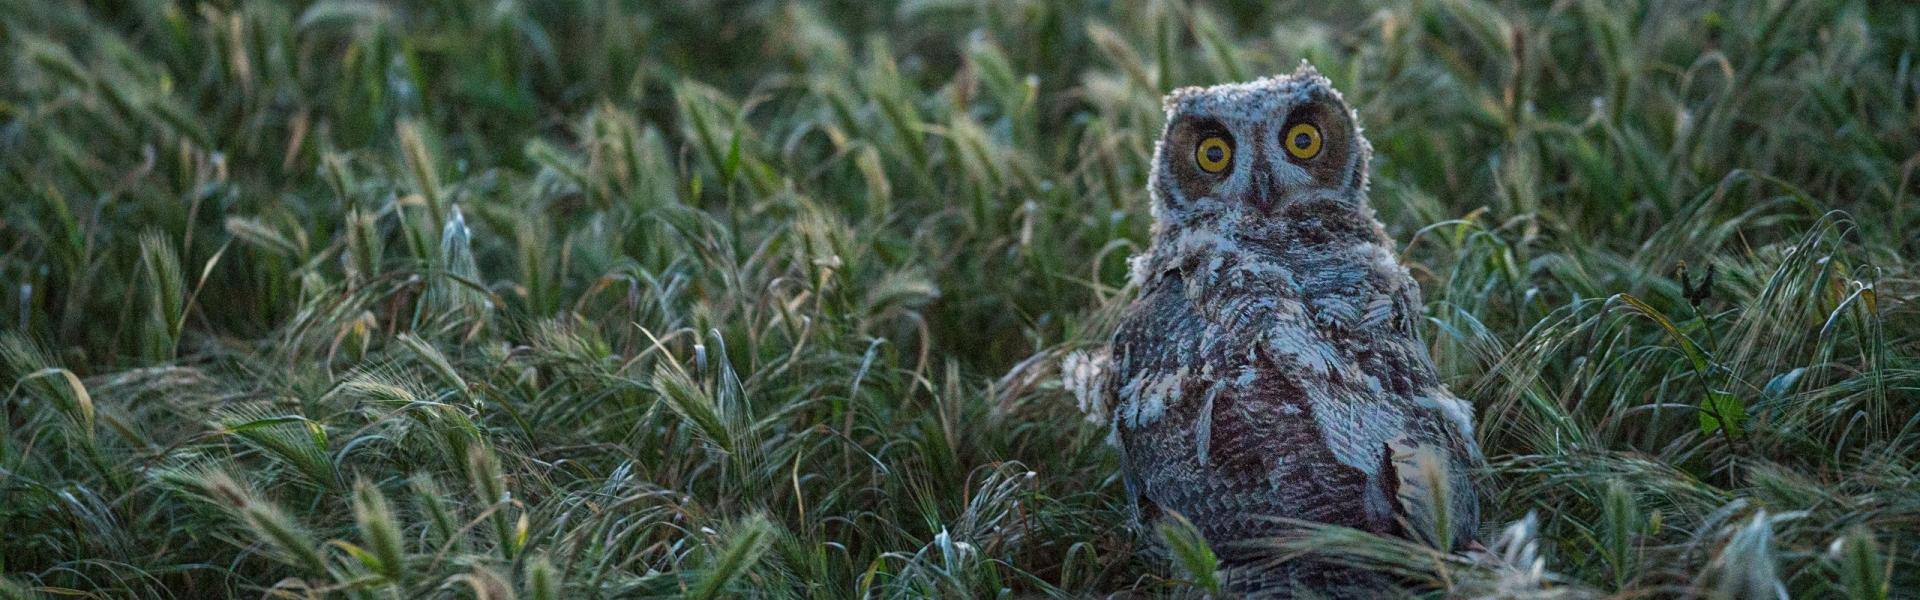 Burrowing owl in a field of grass